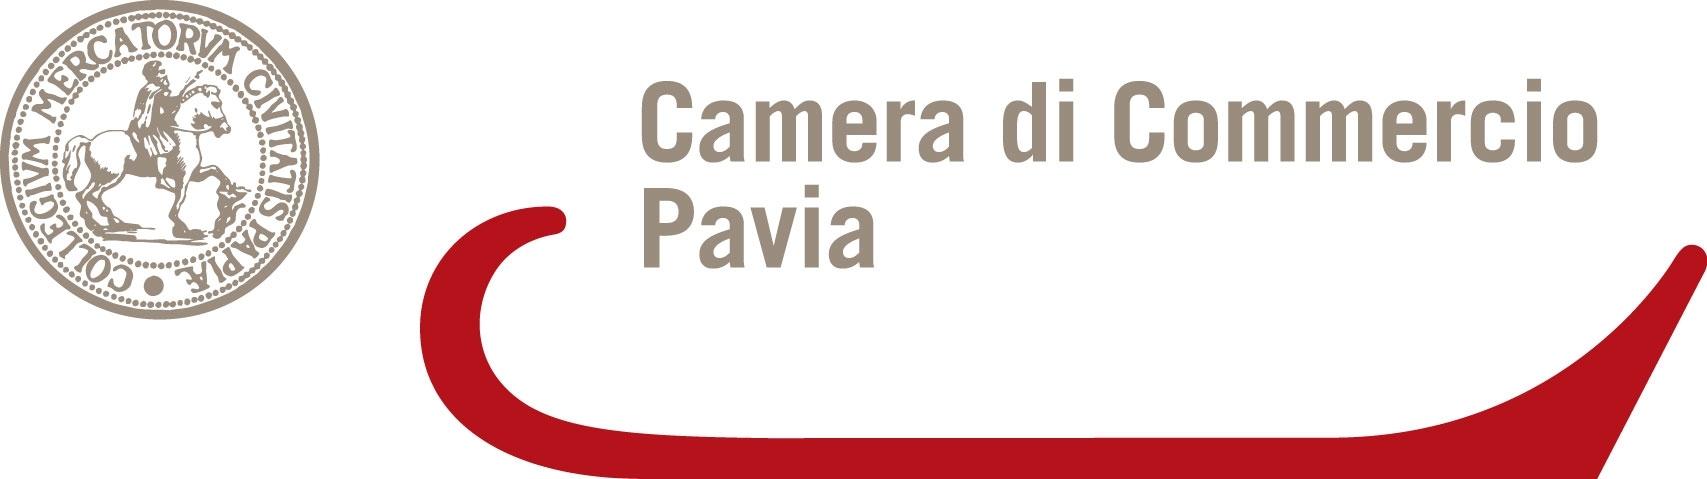 CameraCommercio.JPG (168 KB)